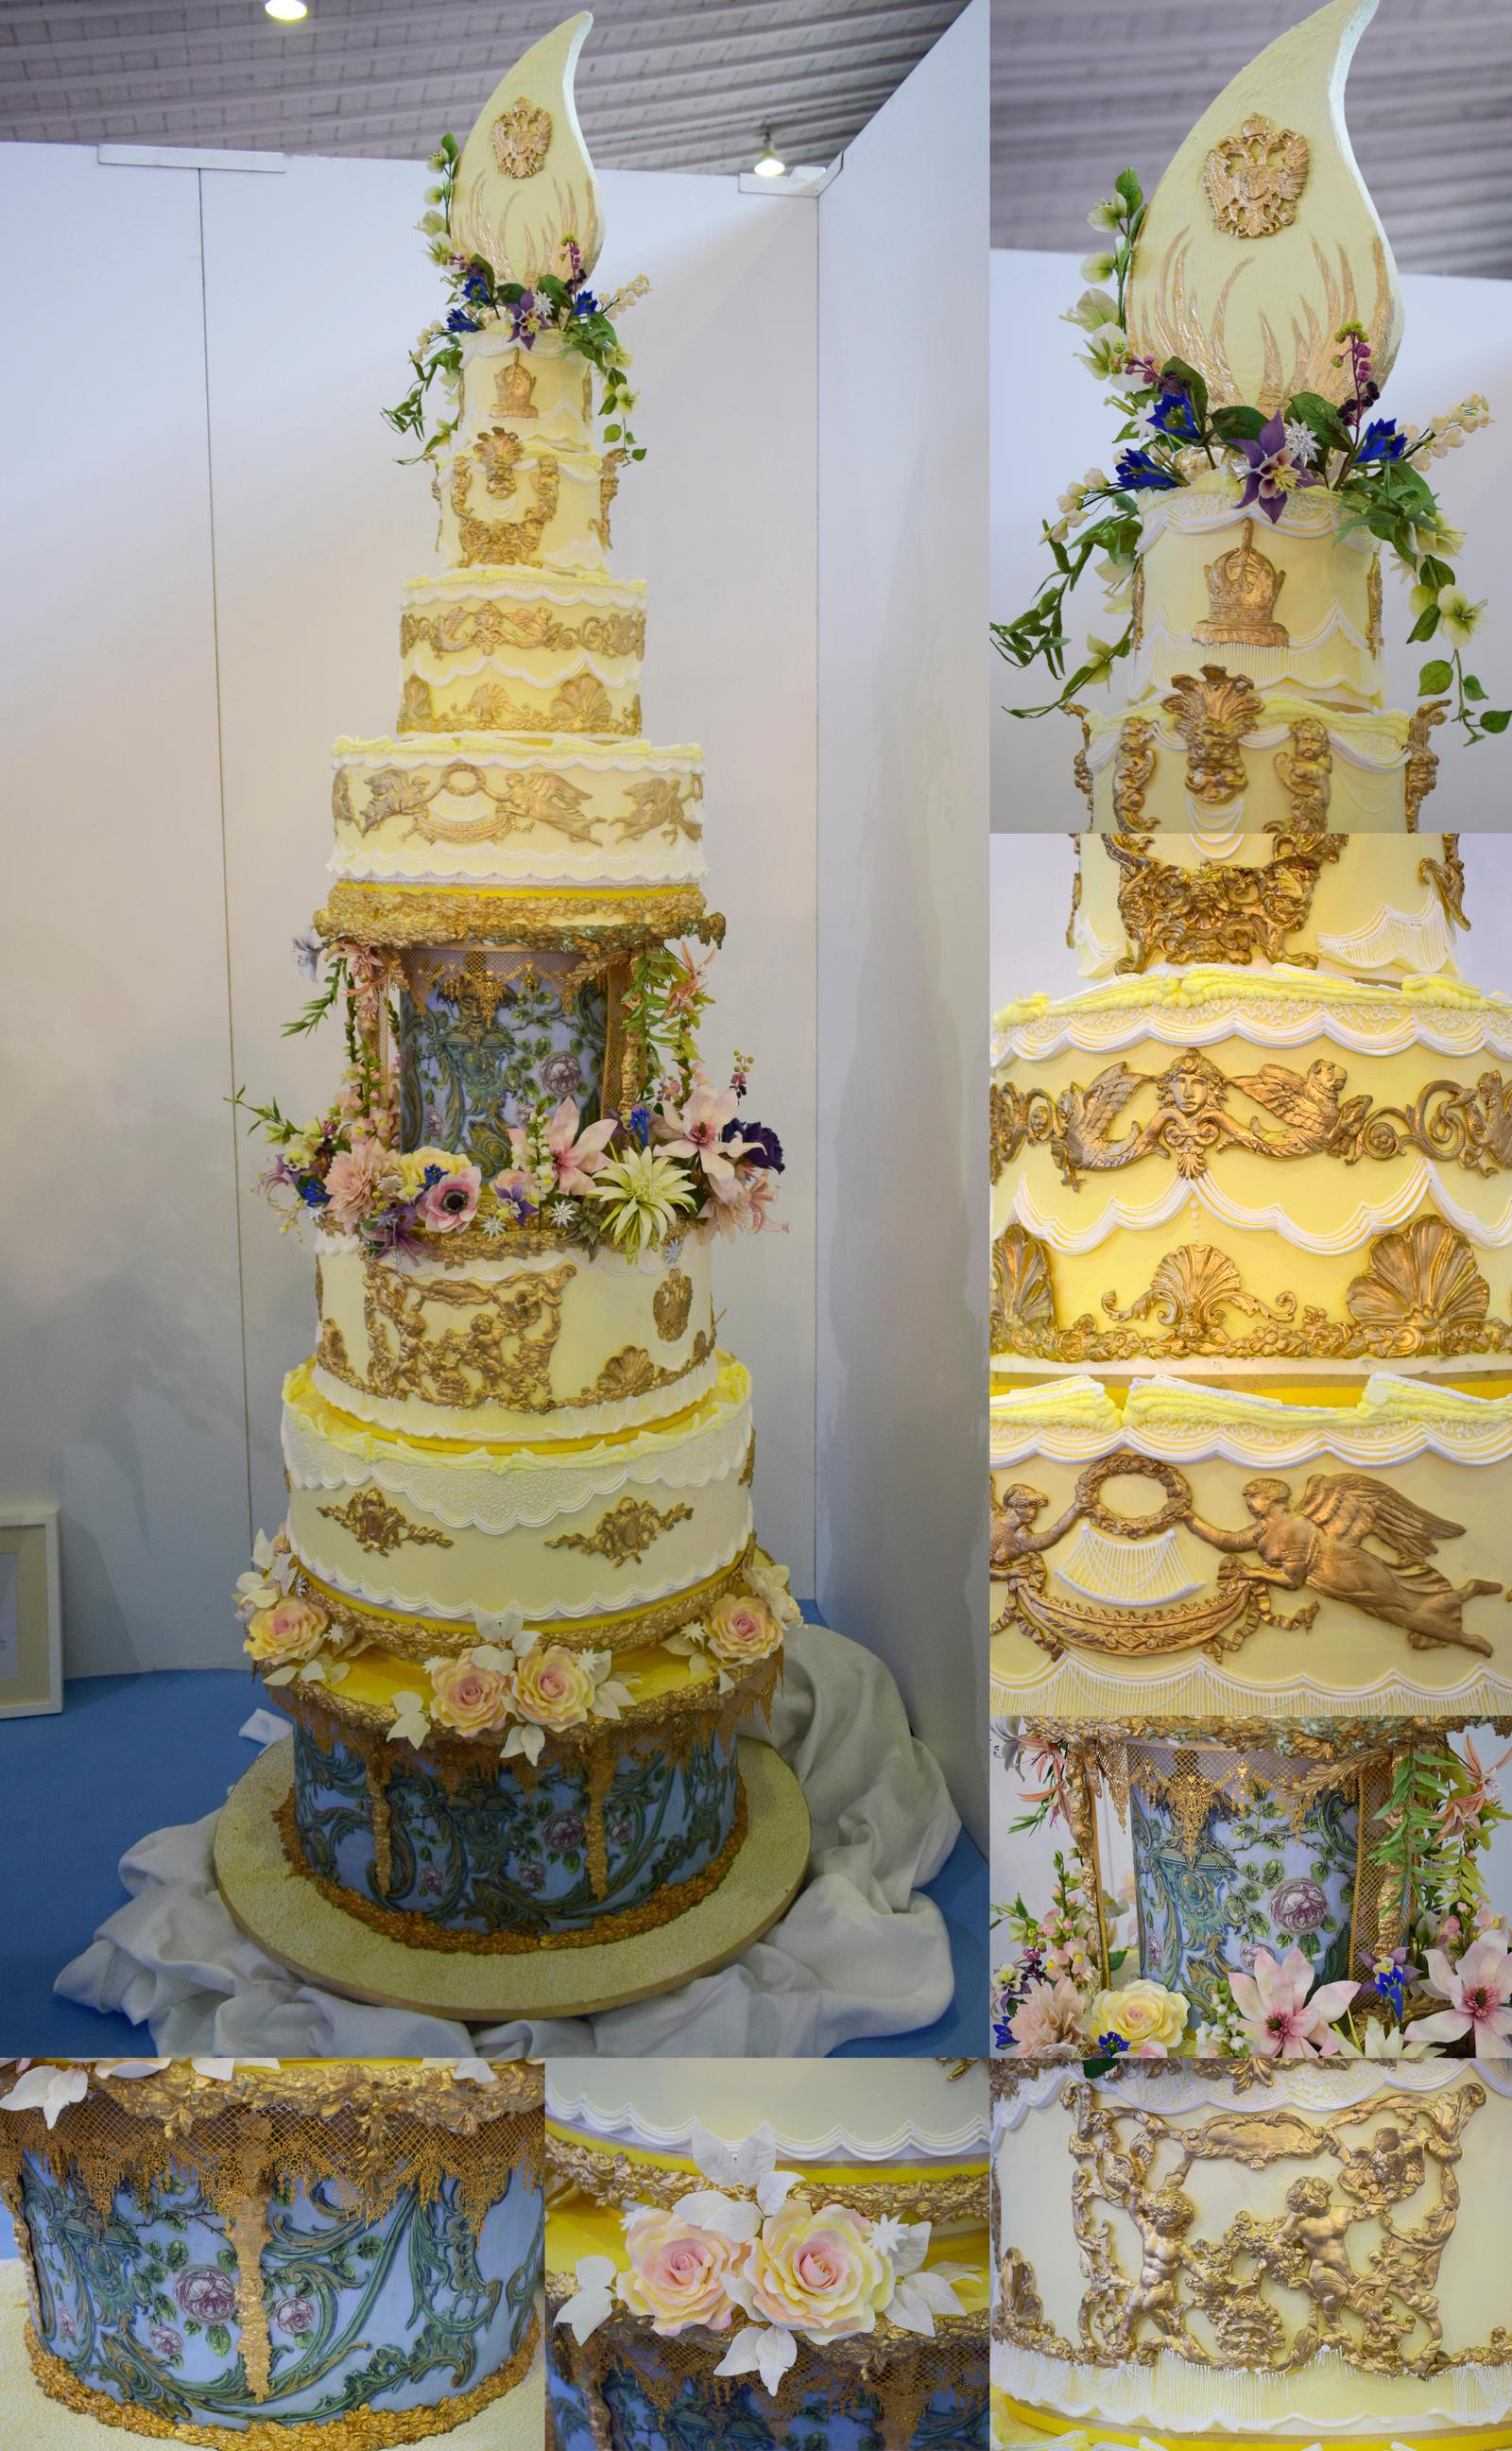 Cake Decorating Shop Claremont Mesa Blvd